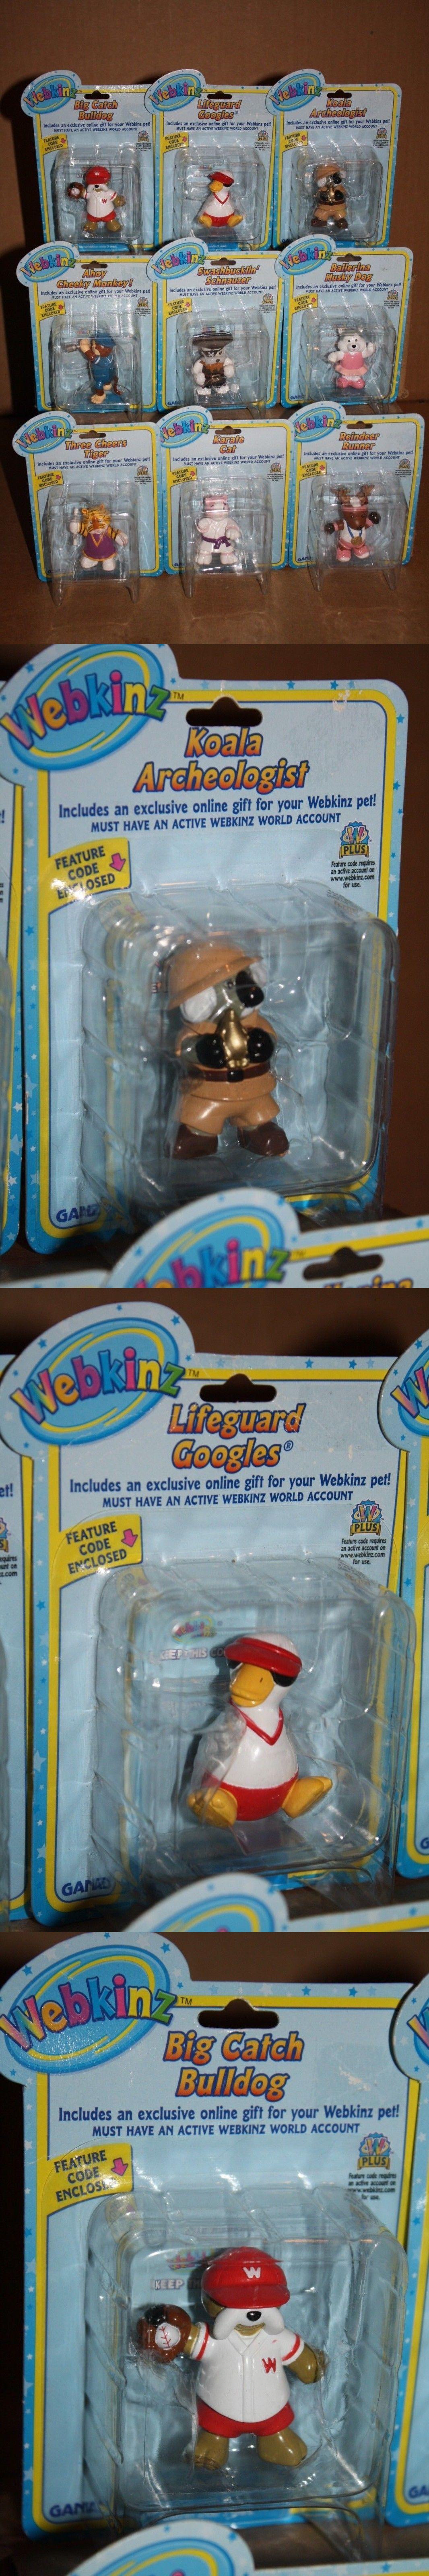 Webkinz Figure Series 2 Ahoy Cheeky Monkey